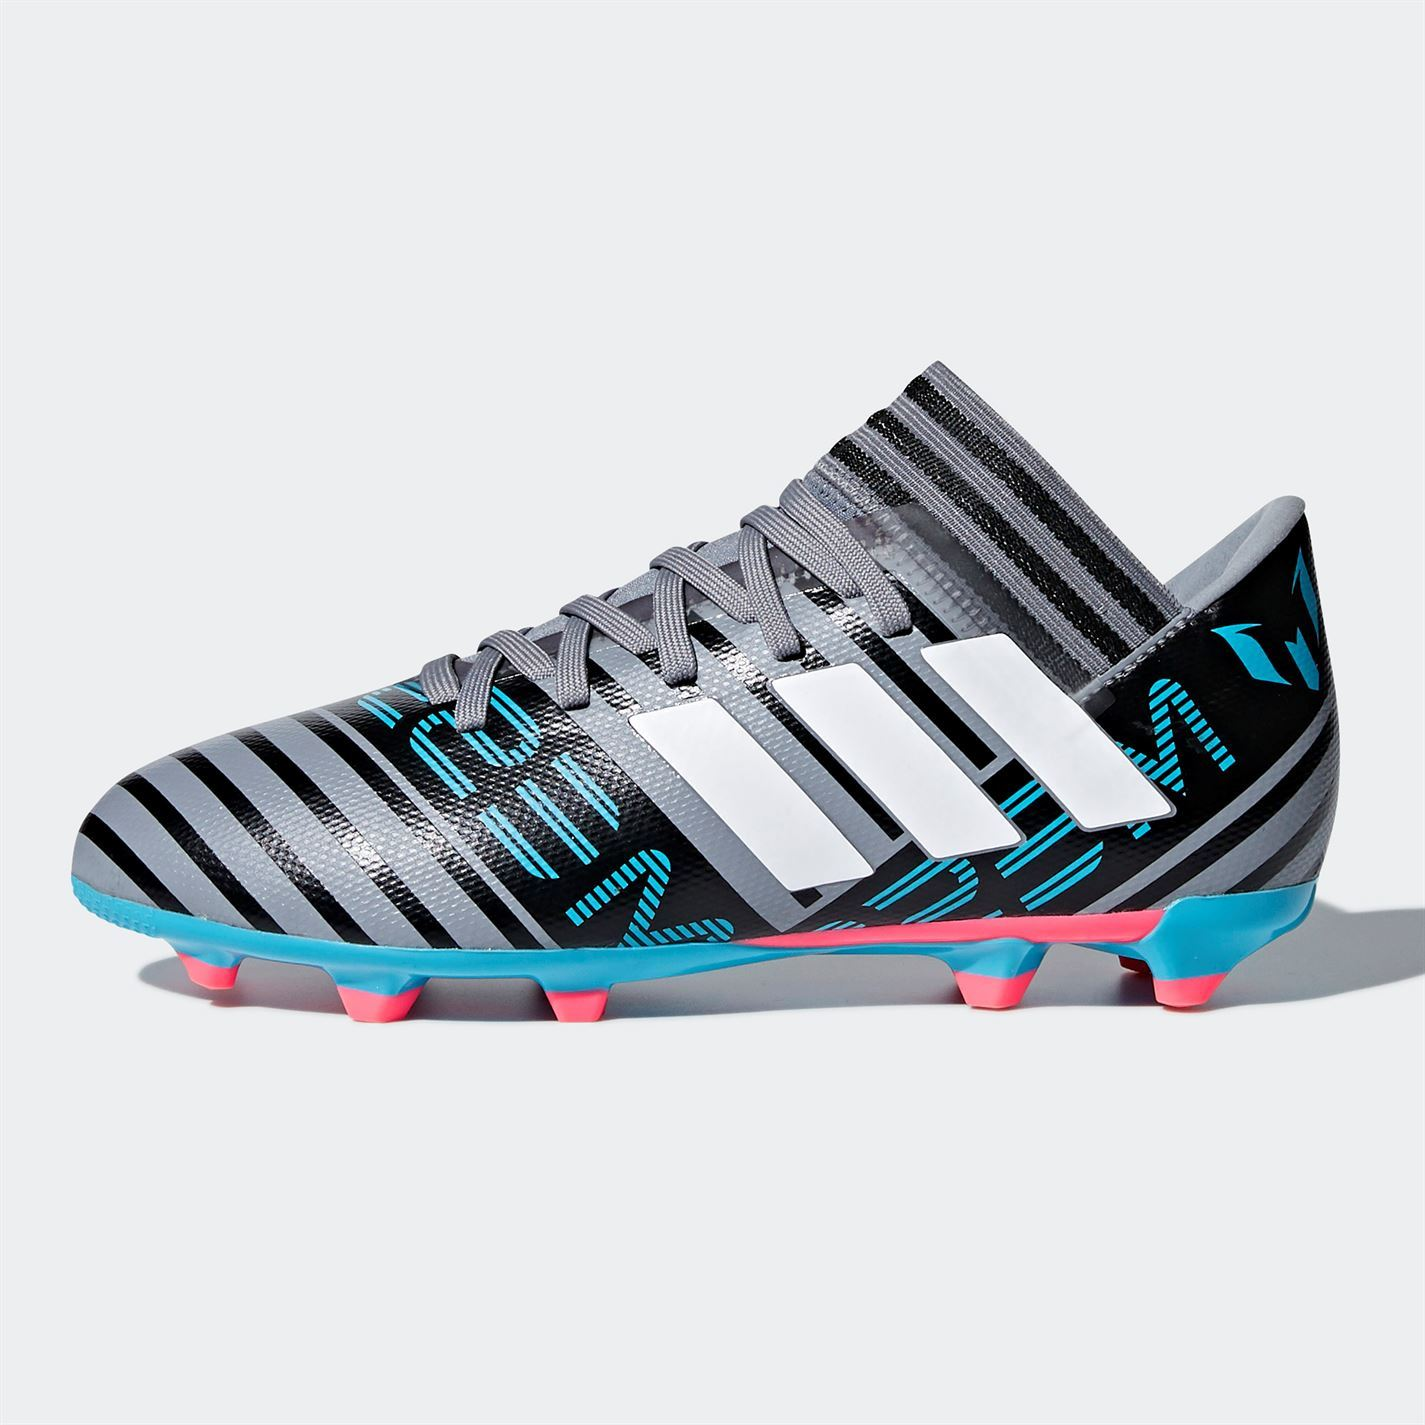 cd7df33f787ba ... Adidas Nemeziz Messi 1 7.3 FG fútbol botas Juniors gris negro Soccer  zapatos tacos ...